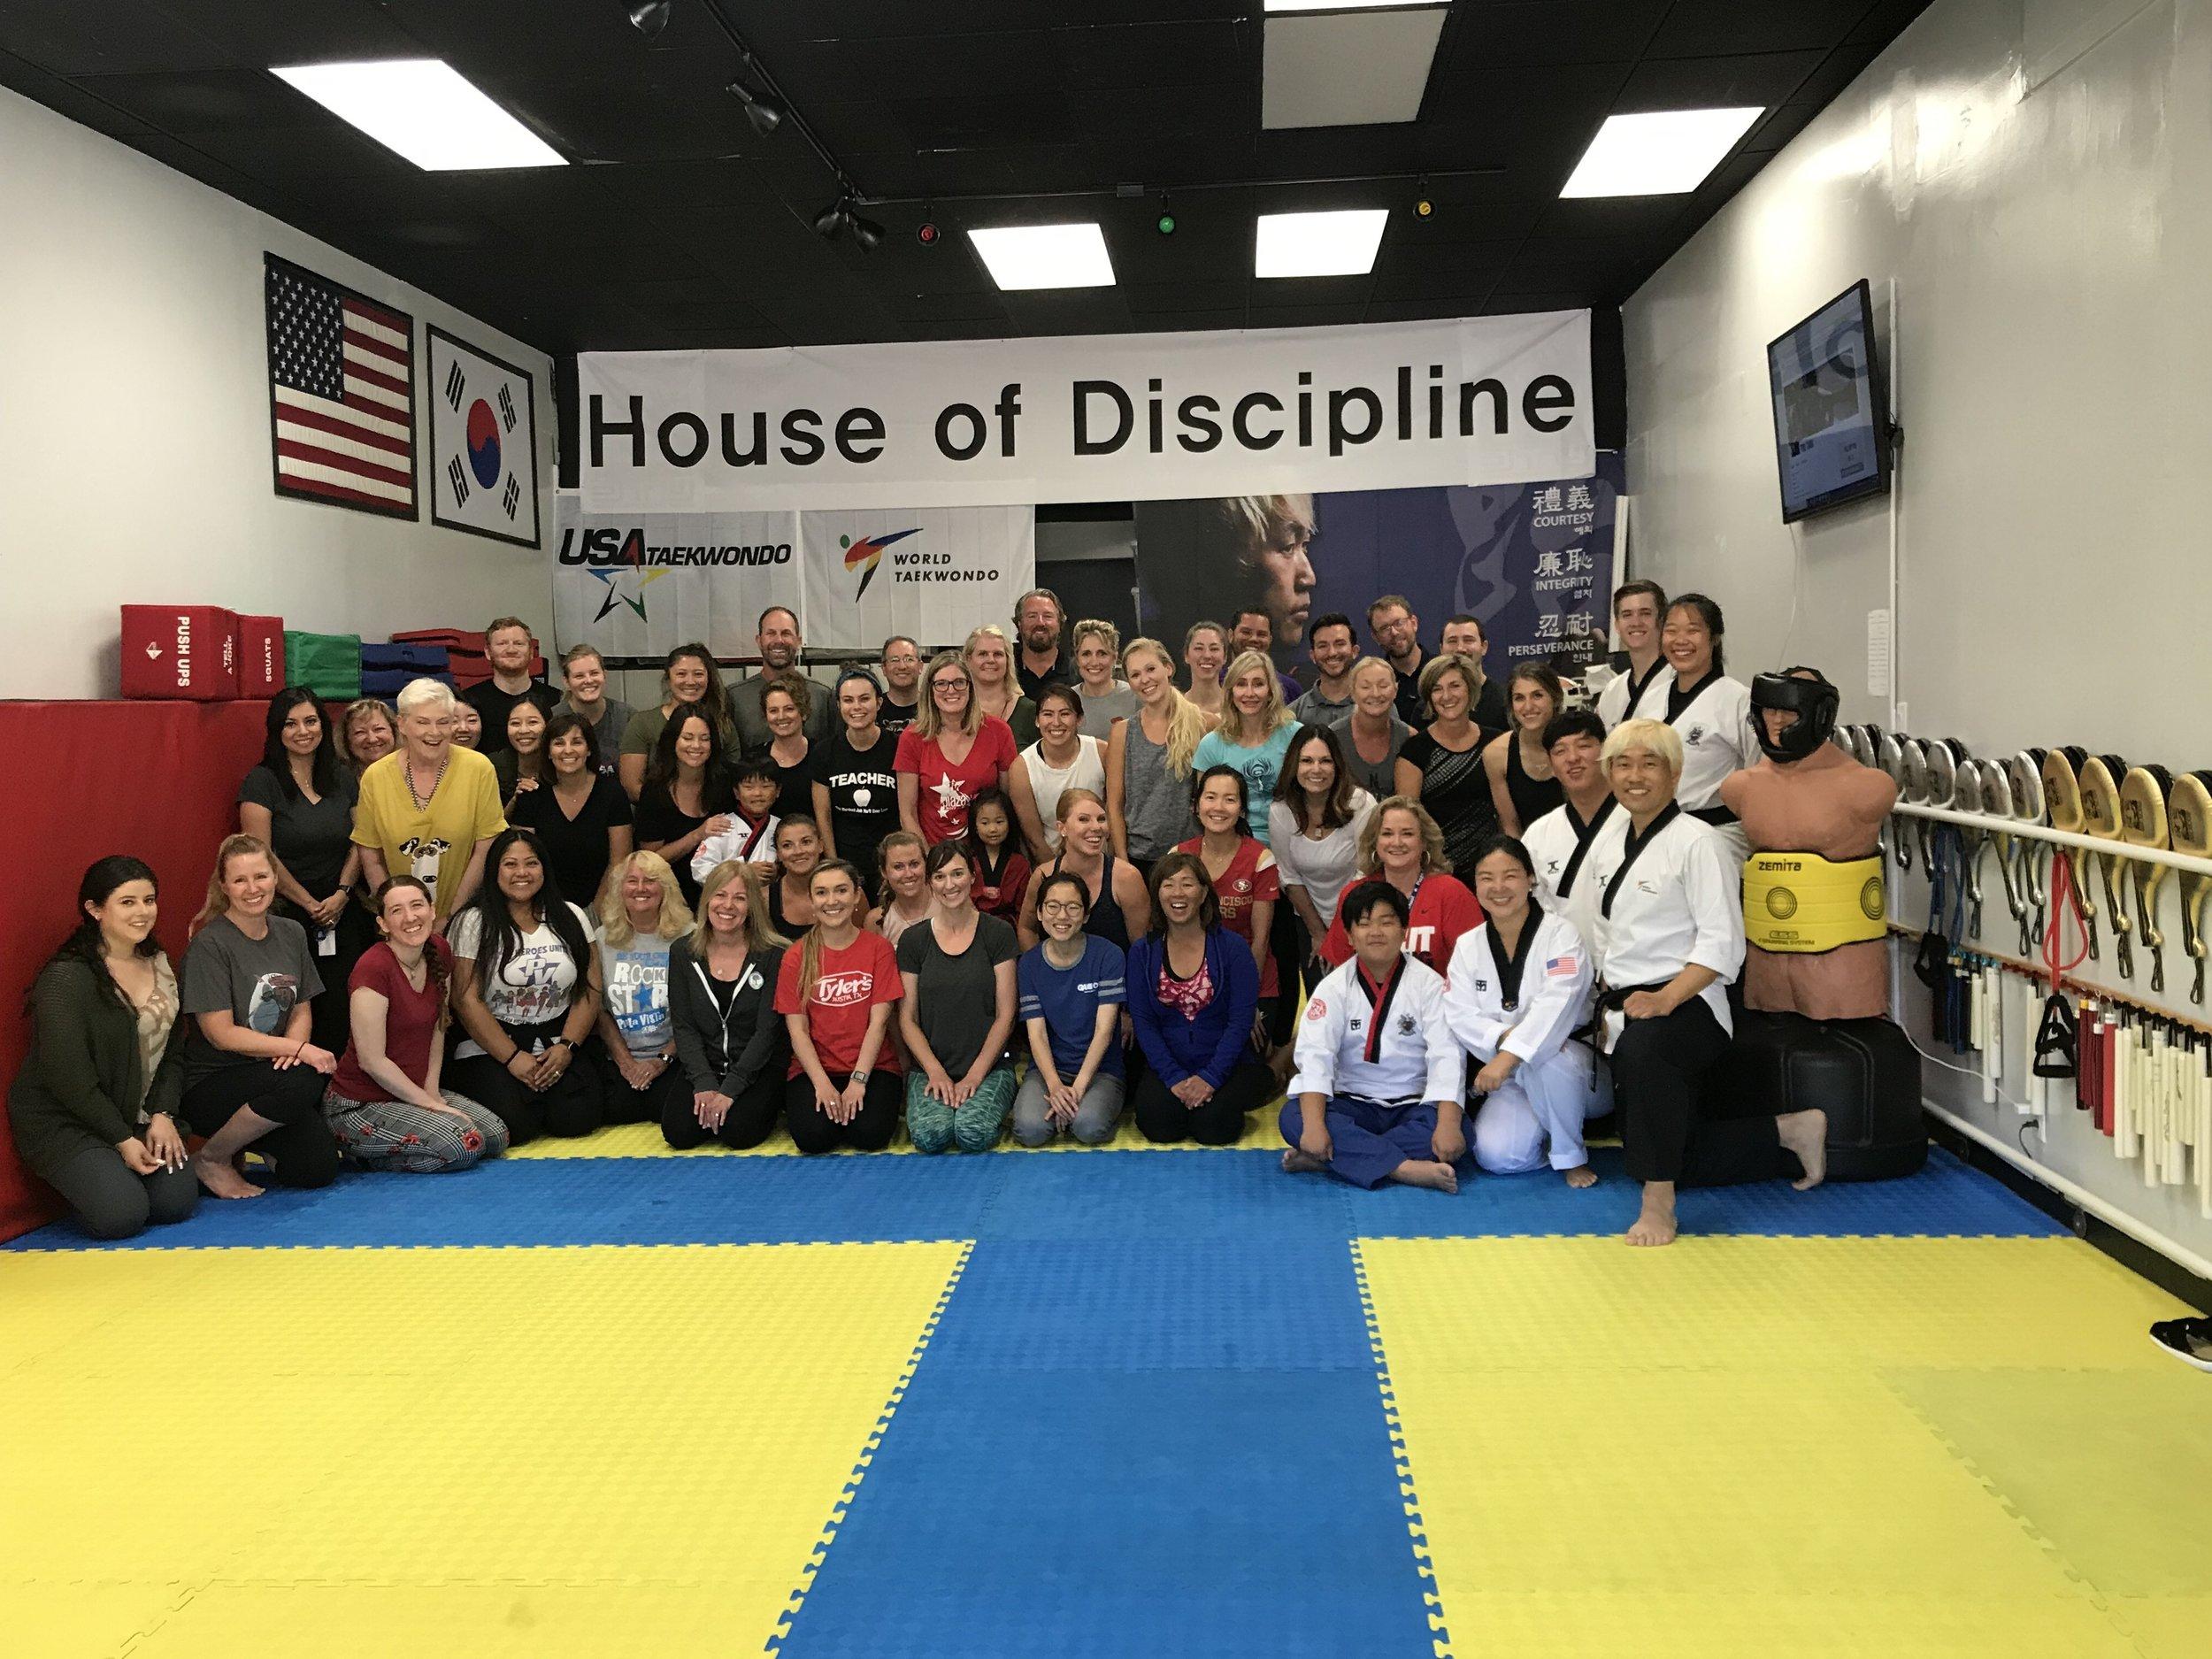 Plaza Vista School TEACHERS Workshop 2019 July